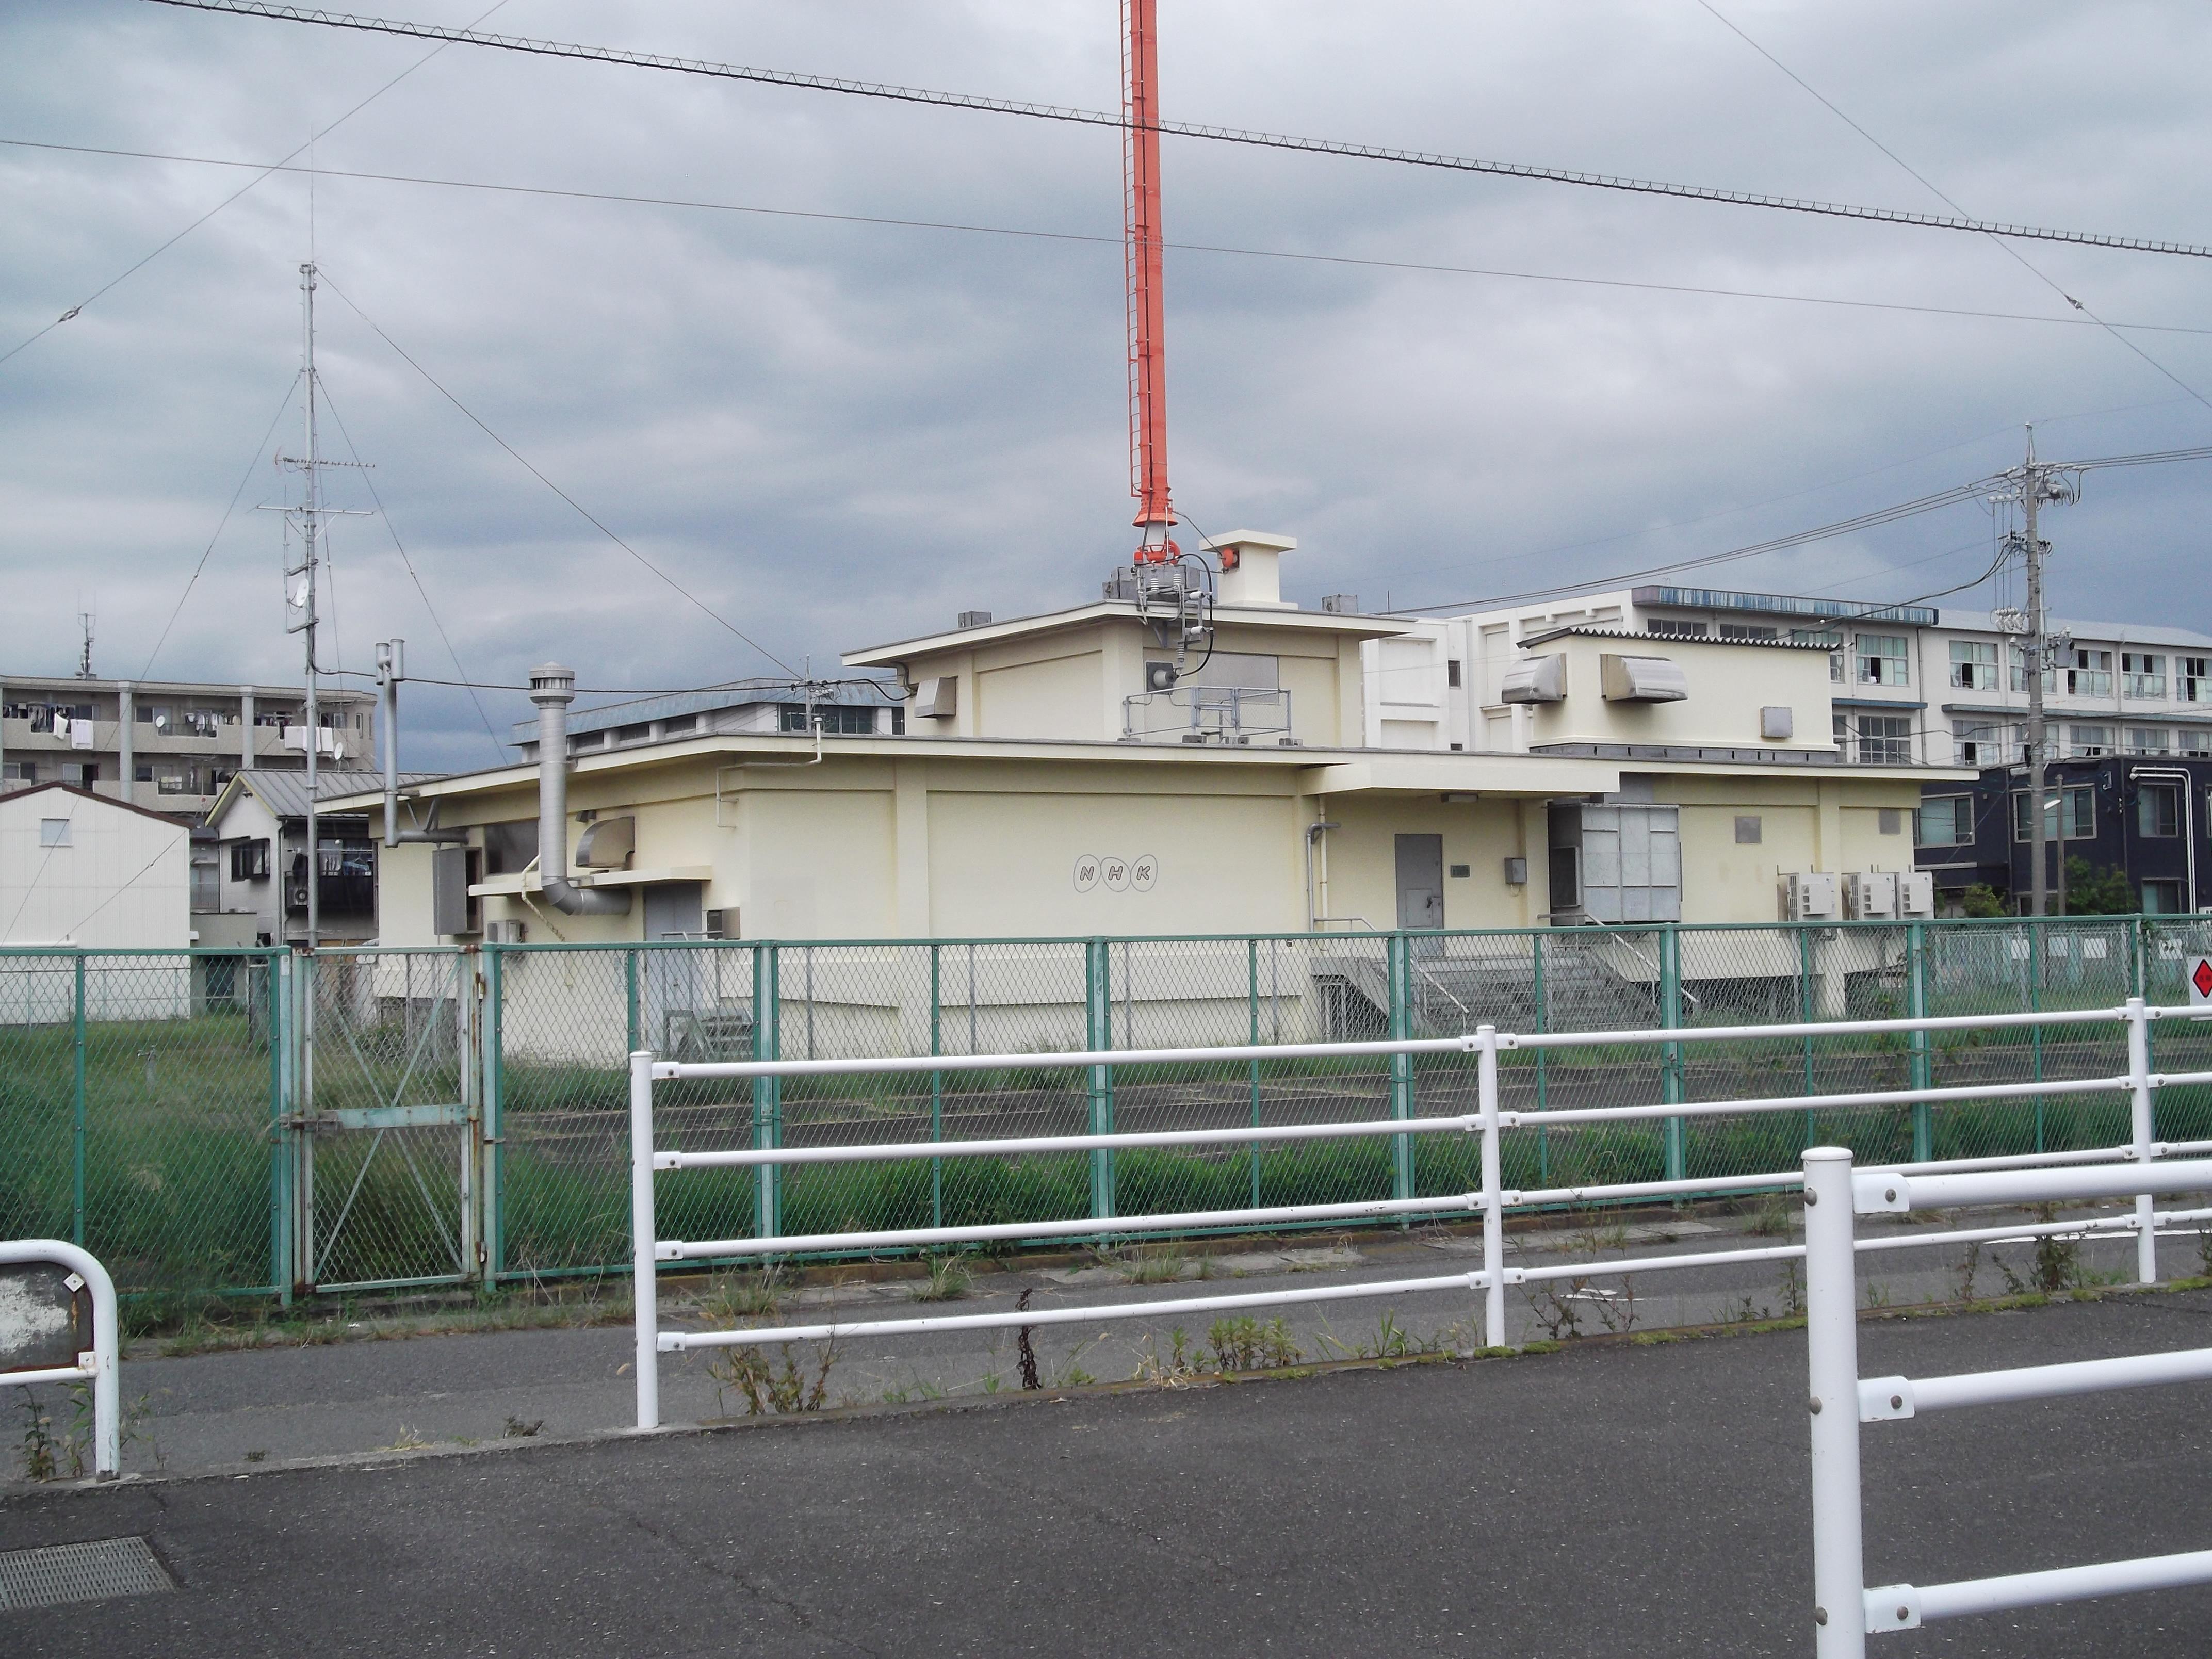 Filebase Building Of Radio Station In Miyatakesuruga Kushizuoka A City